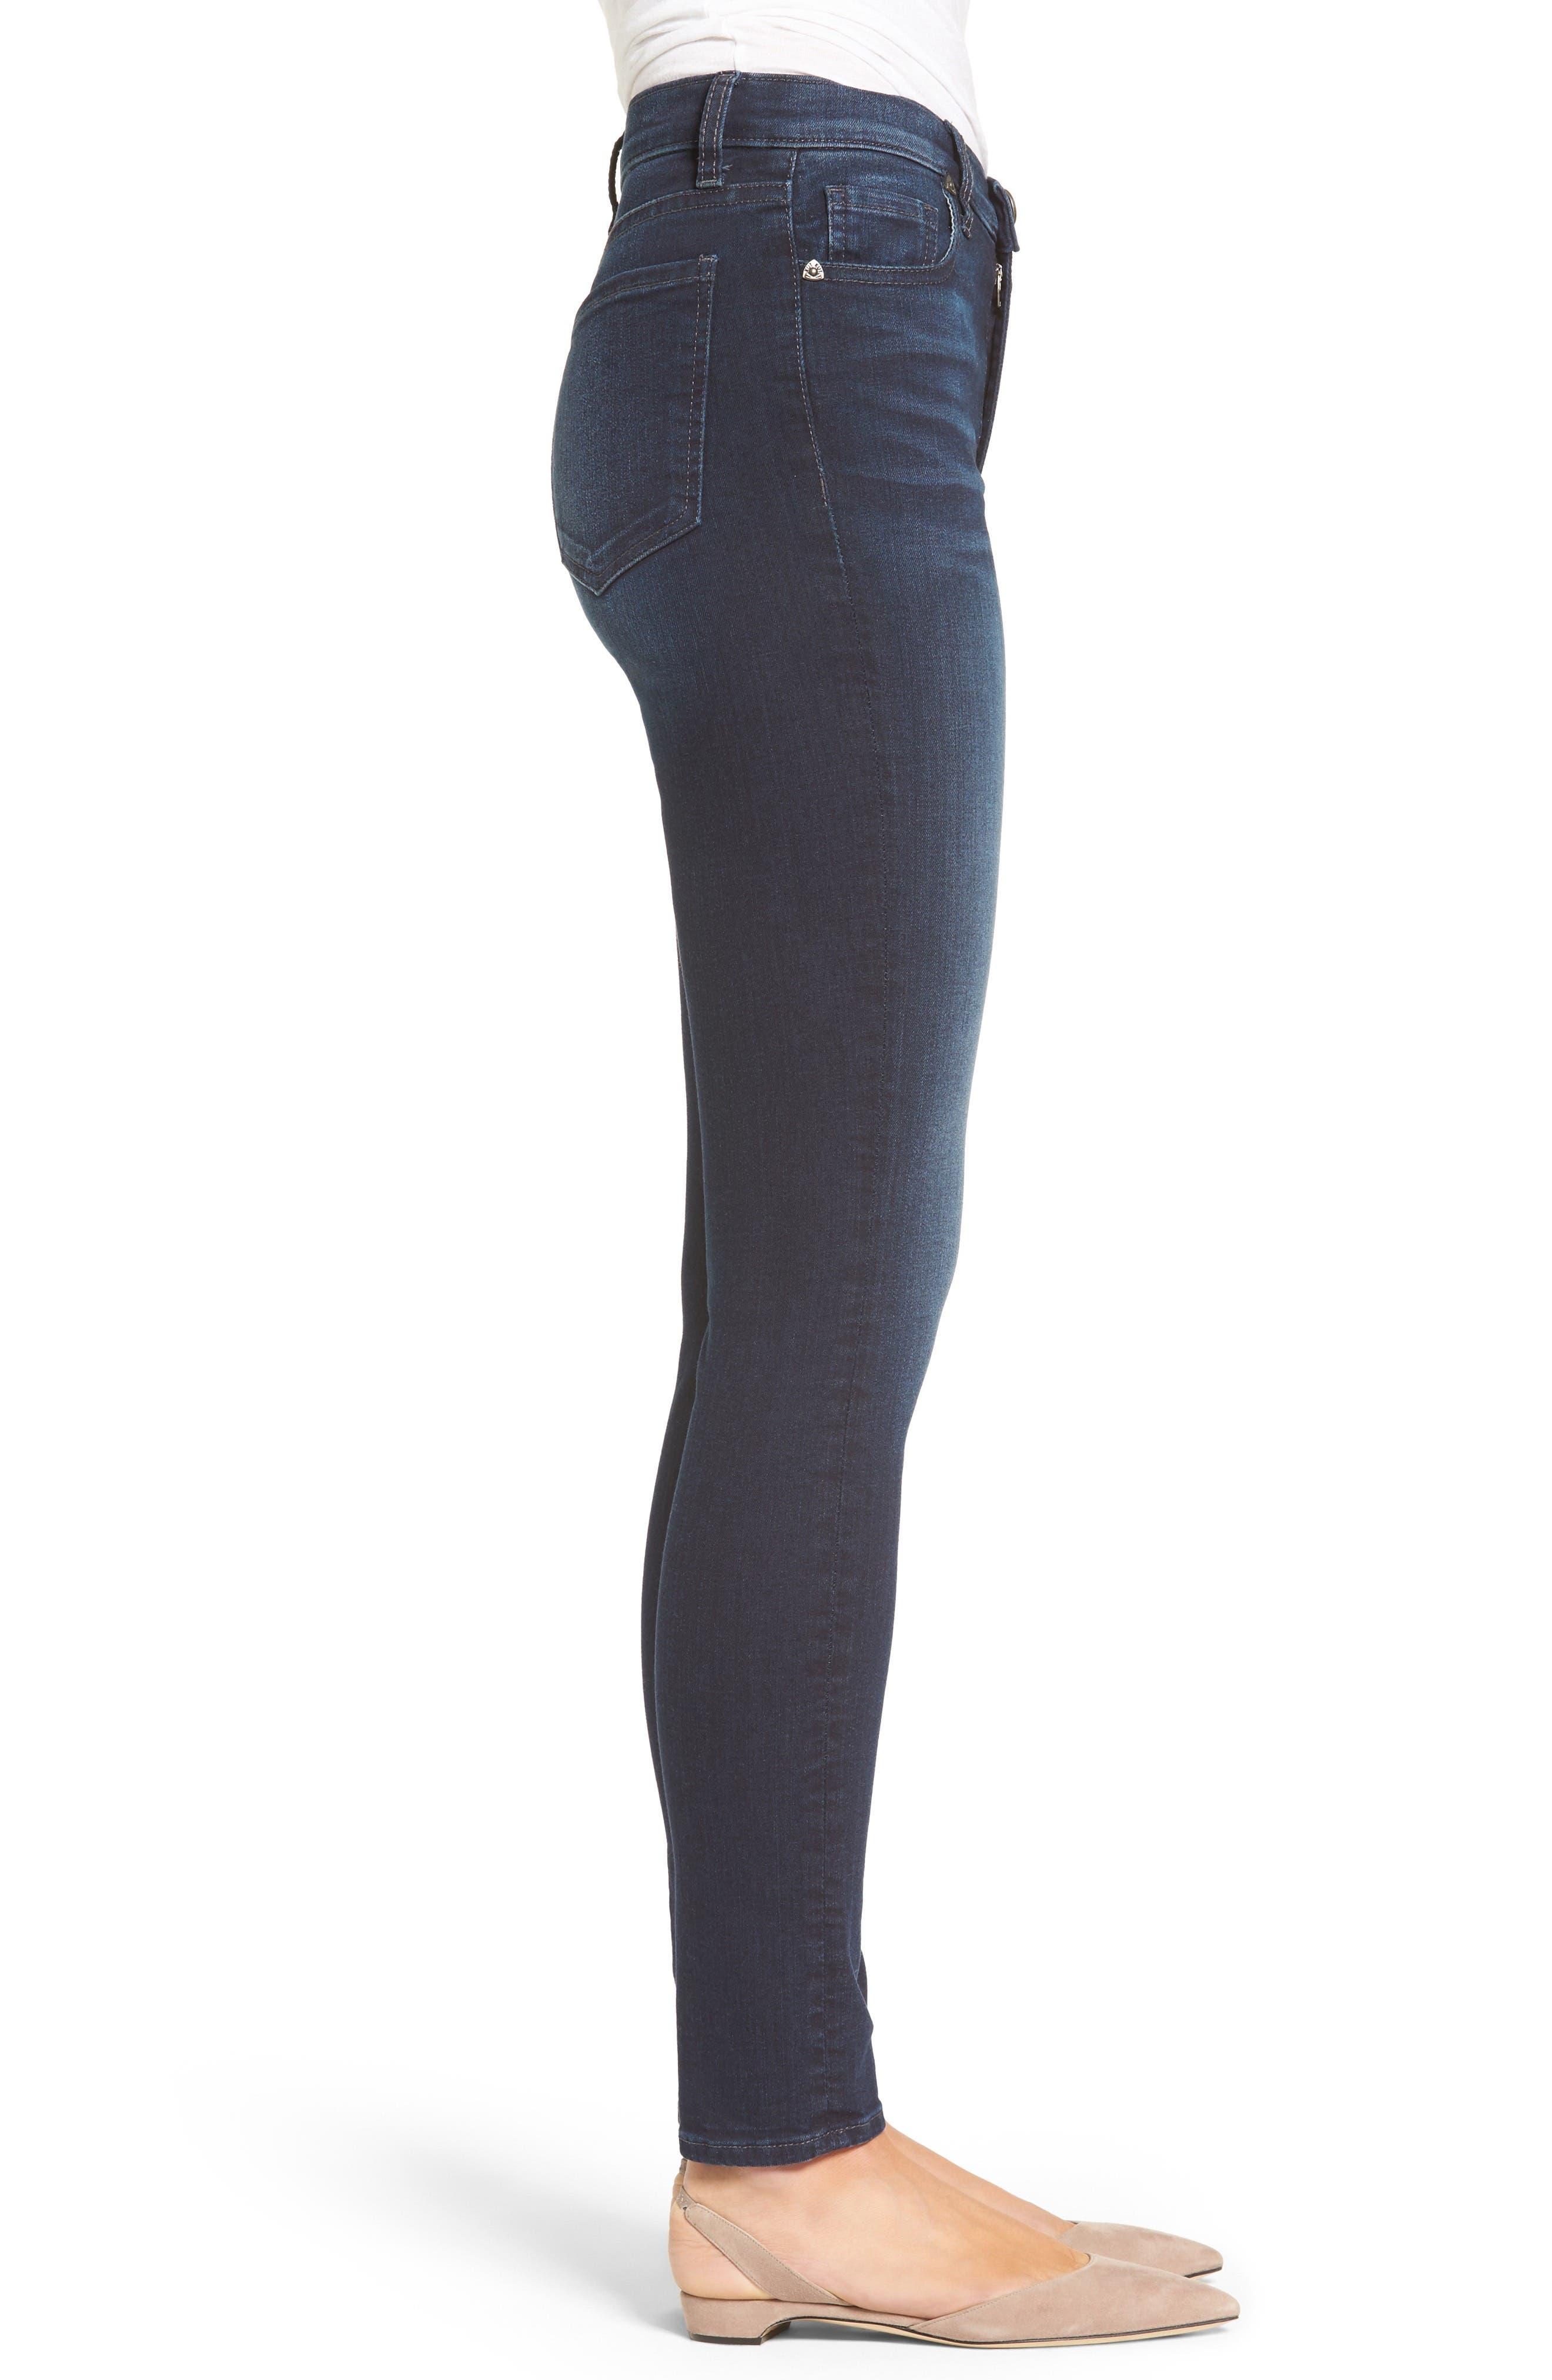 Mia High Waist Skinny Jeans,                             Alternate thumbnail 3, color,